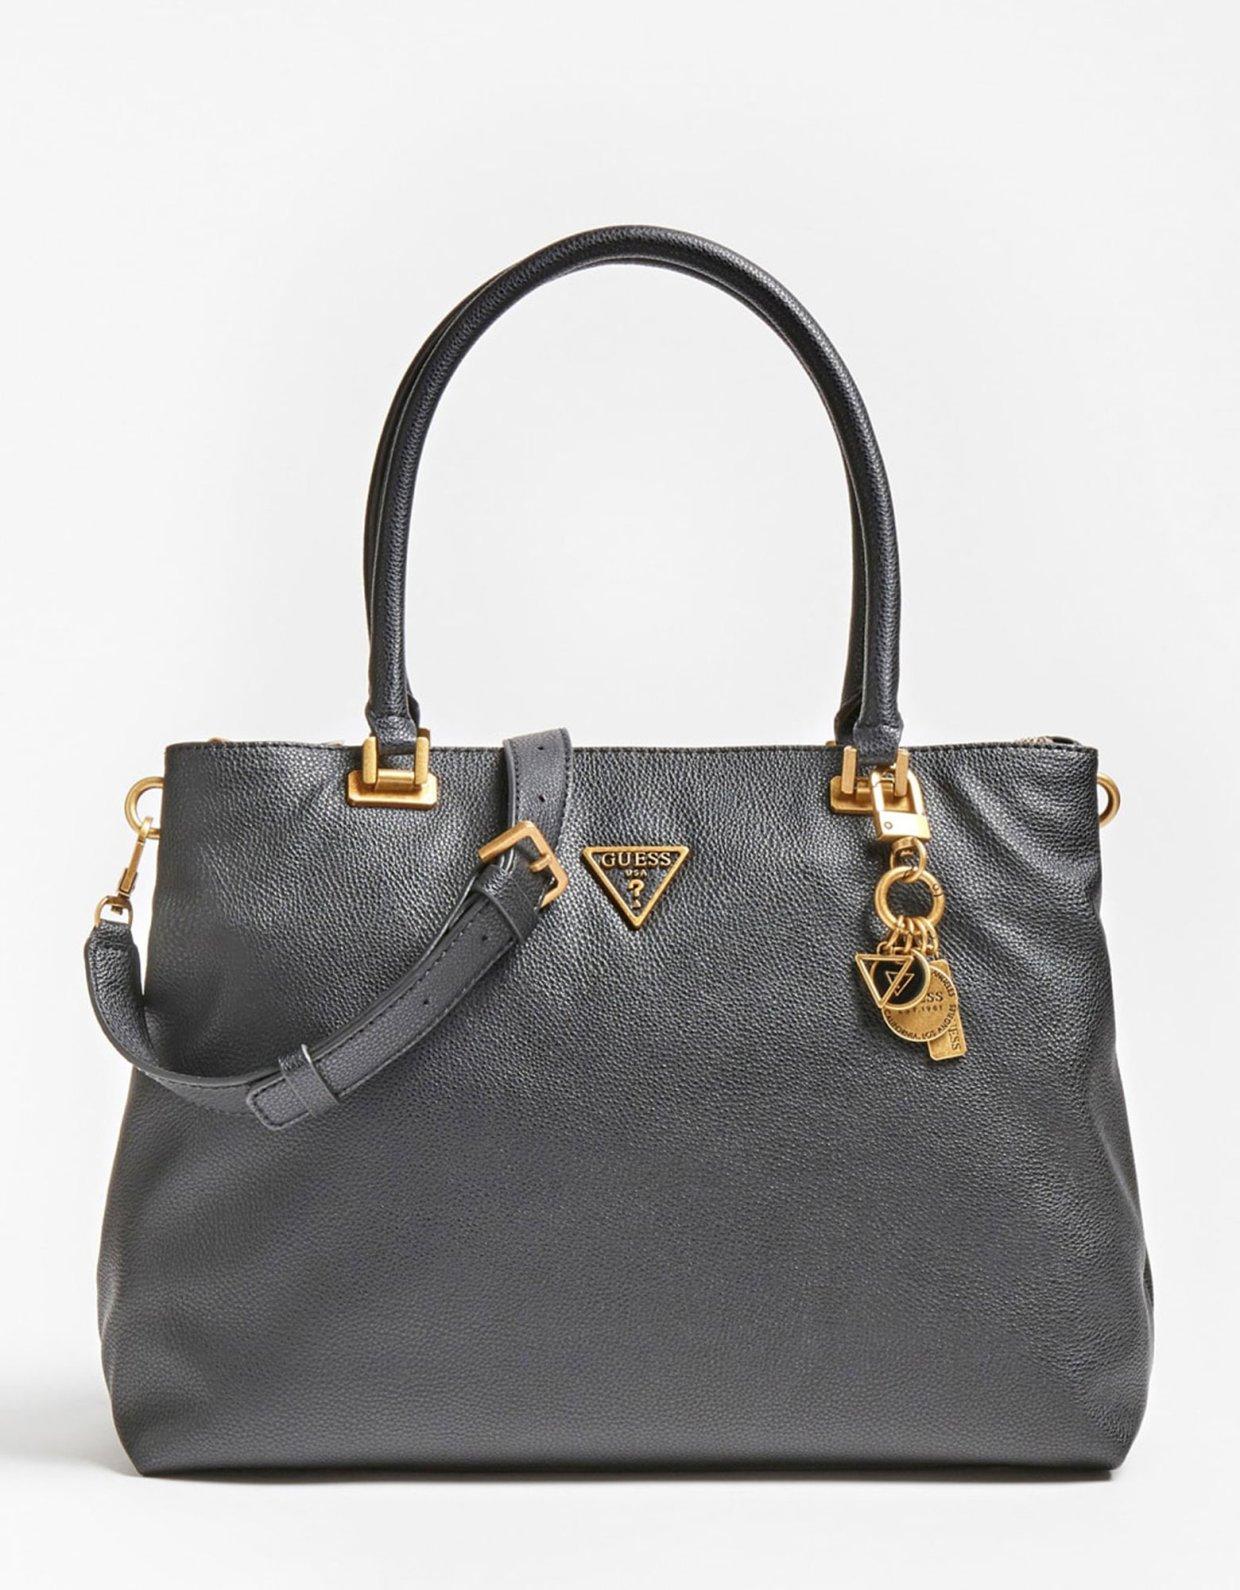 Guess Destiny society carry all shoulder bag black